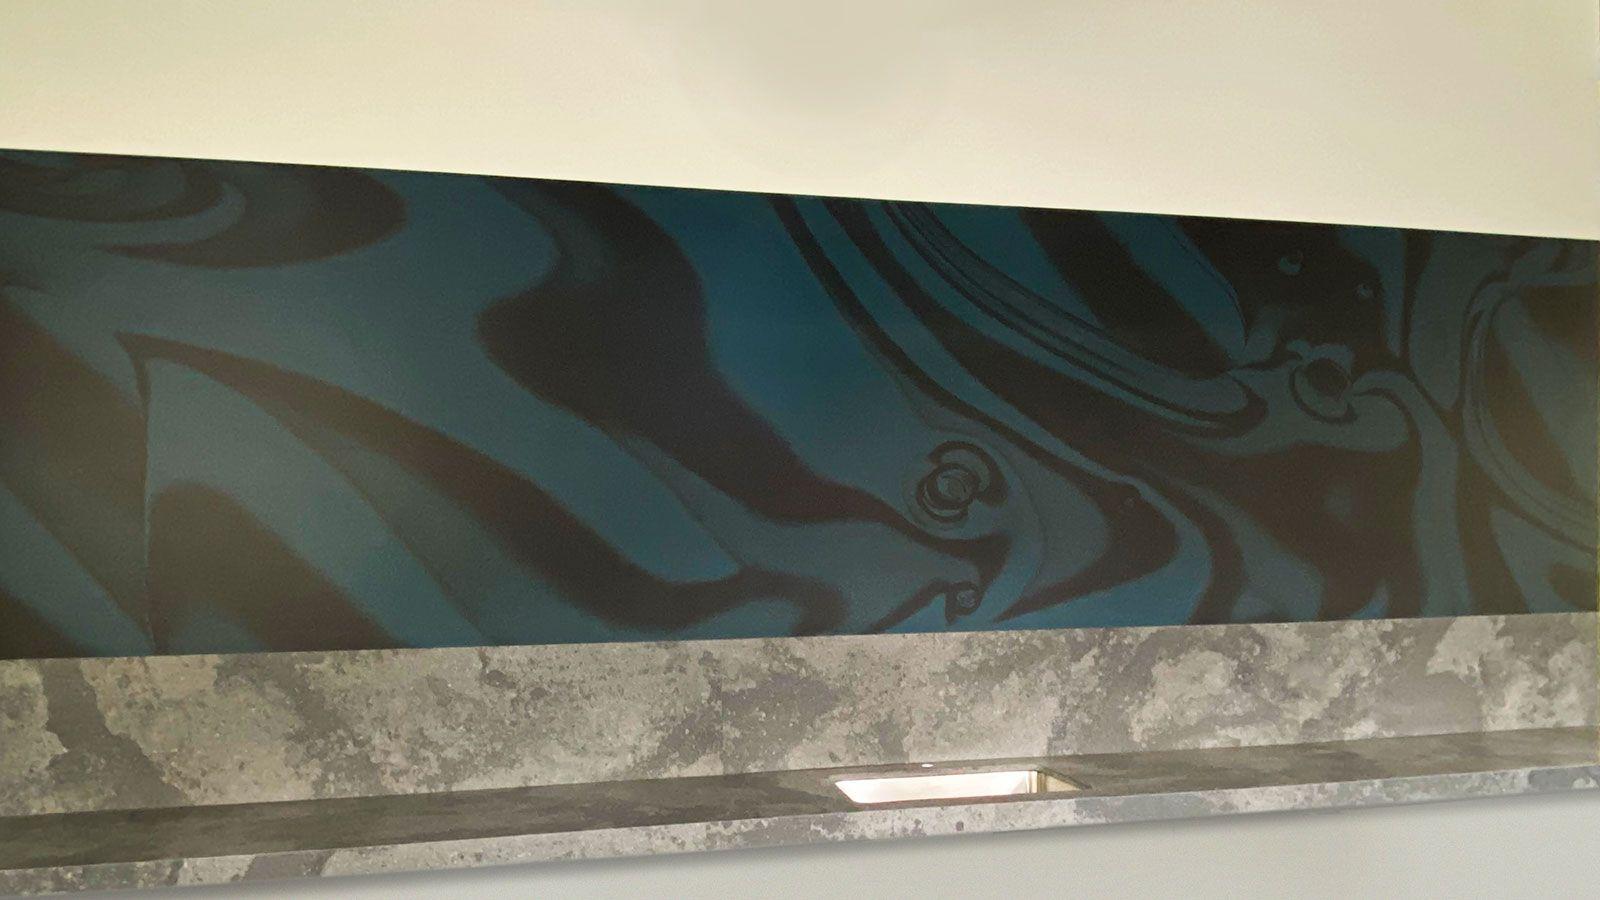 interior branding wall decal